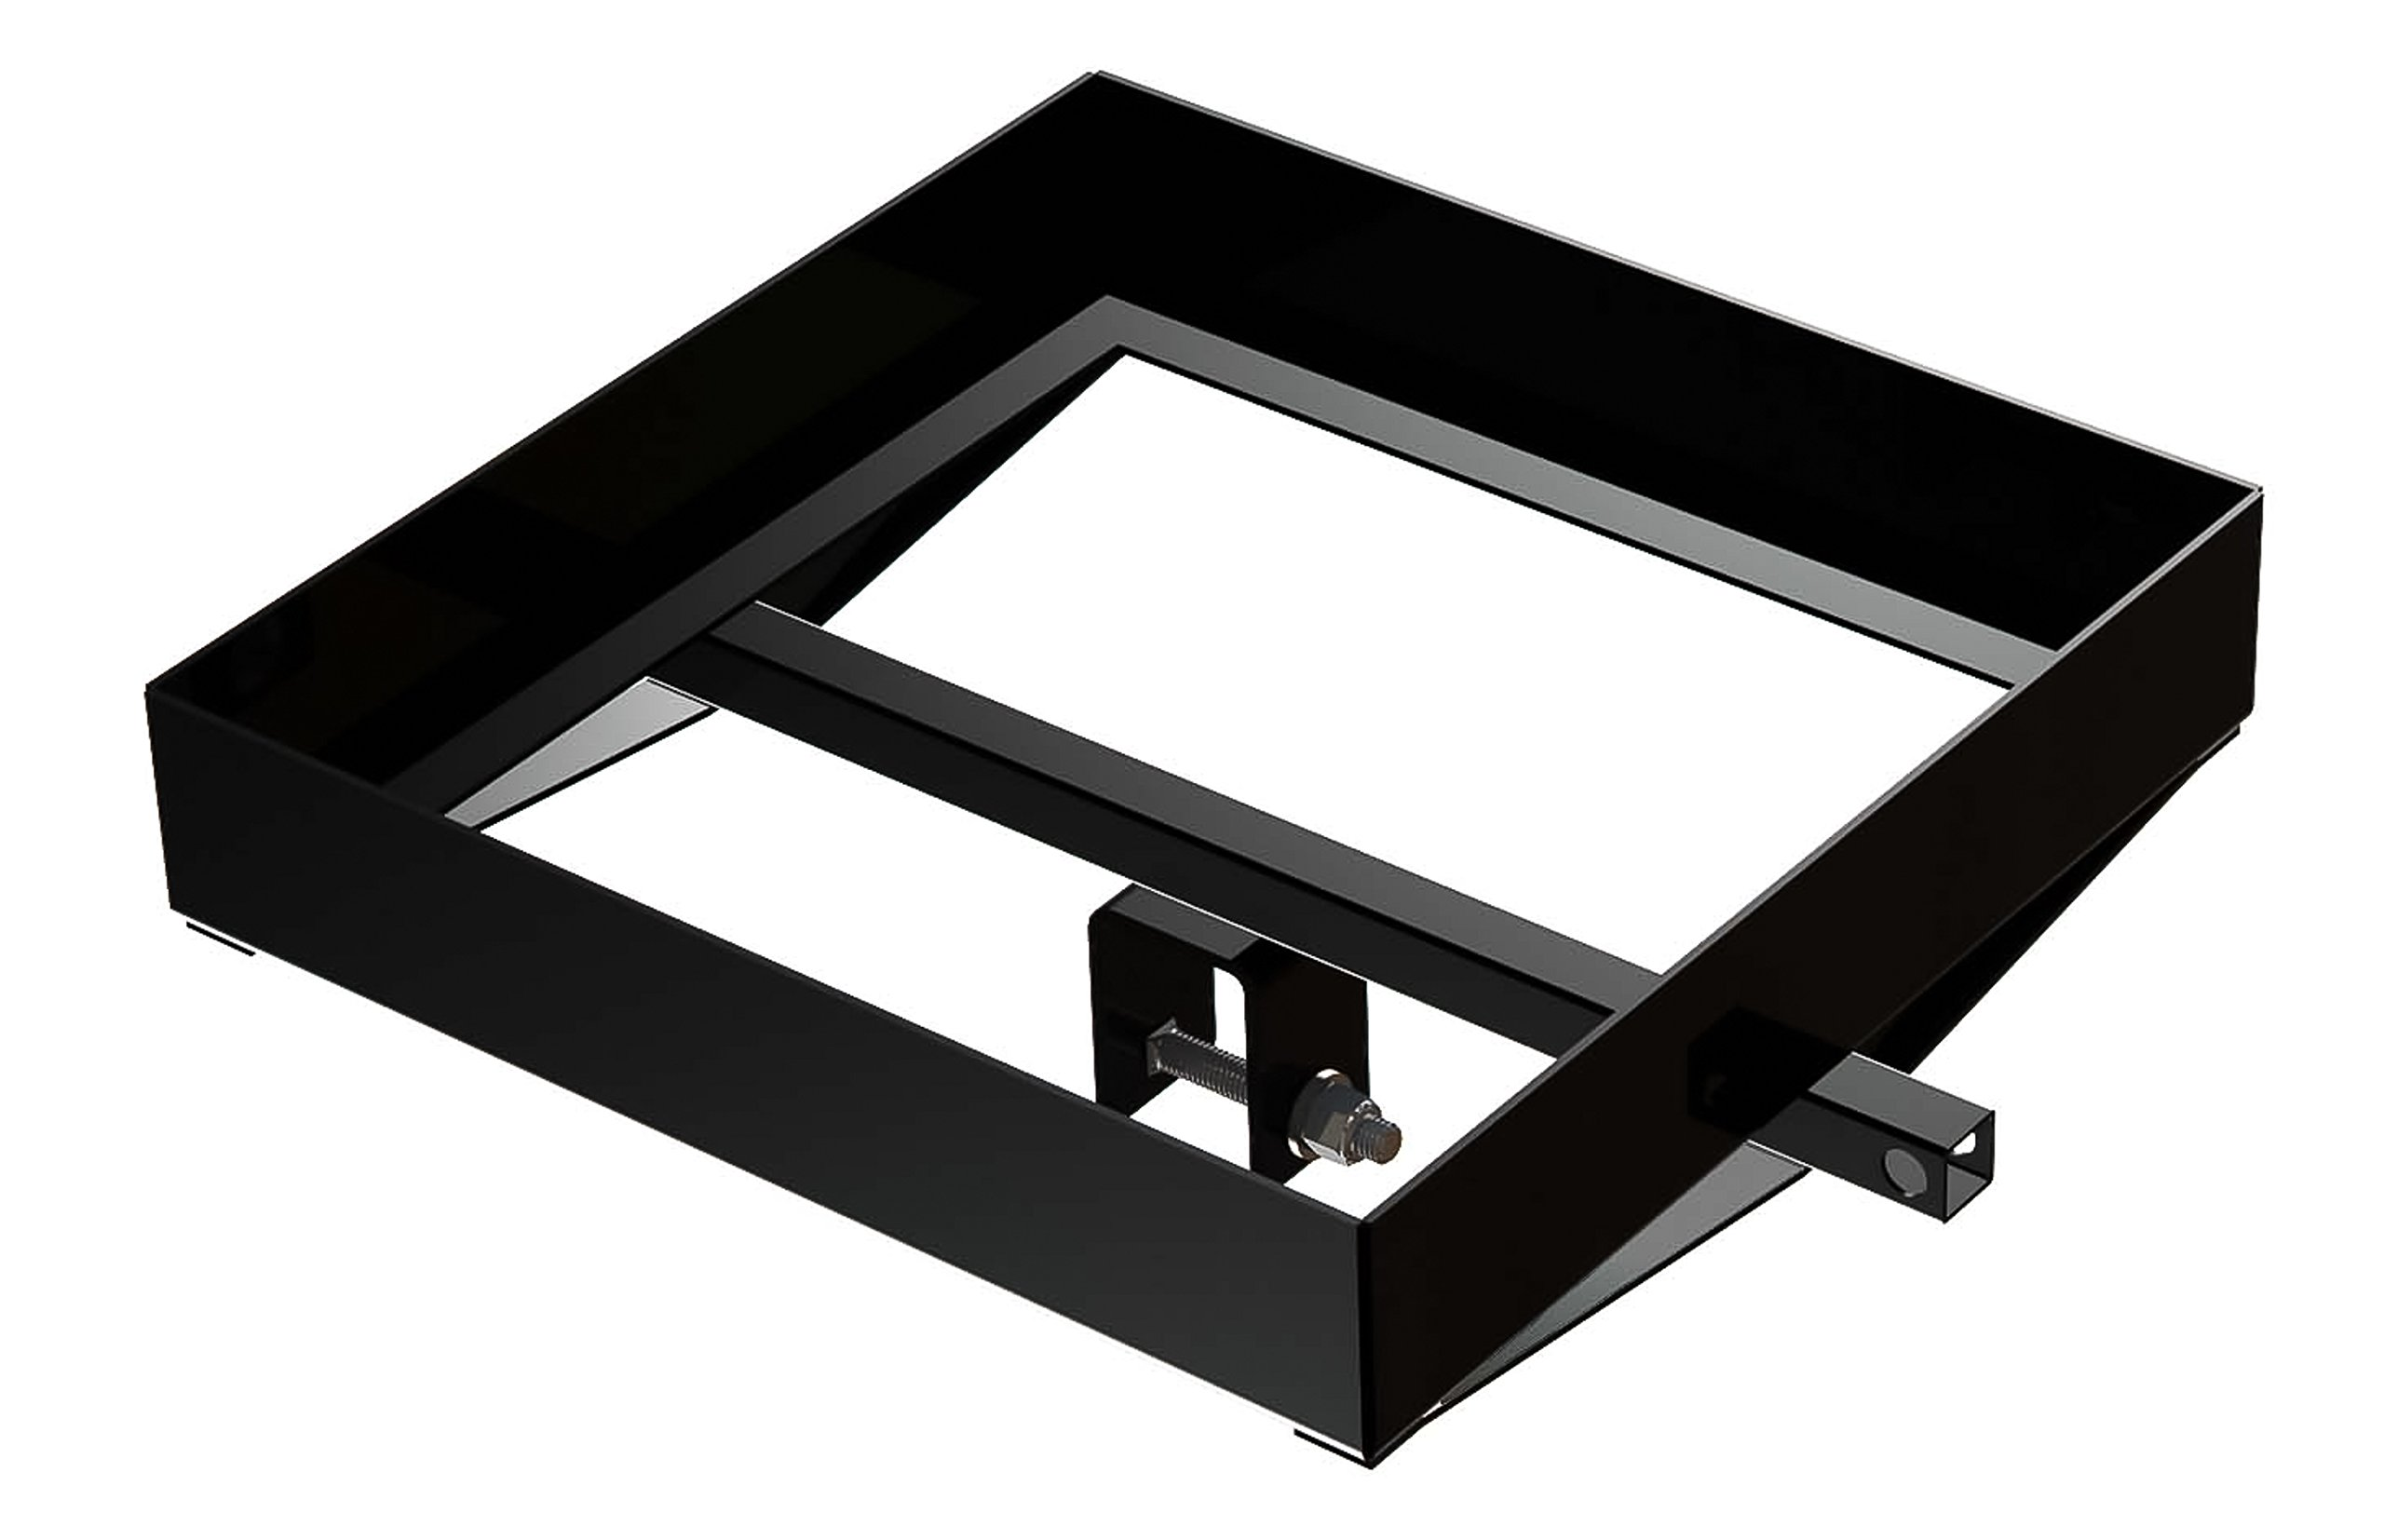 Black Boar UTV Basket for Adding Additional Weight to ATV Implements (66006)